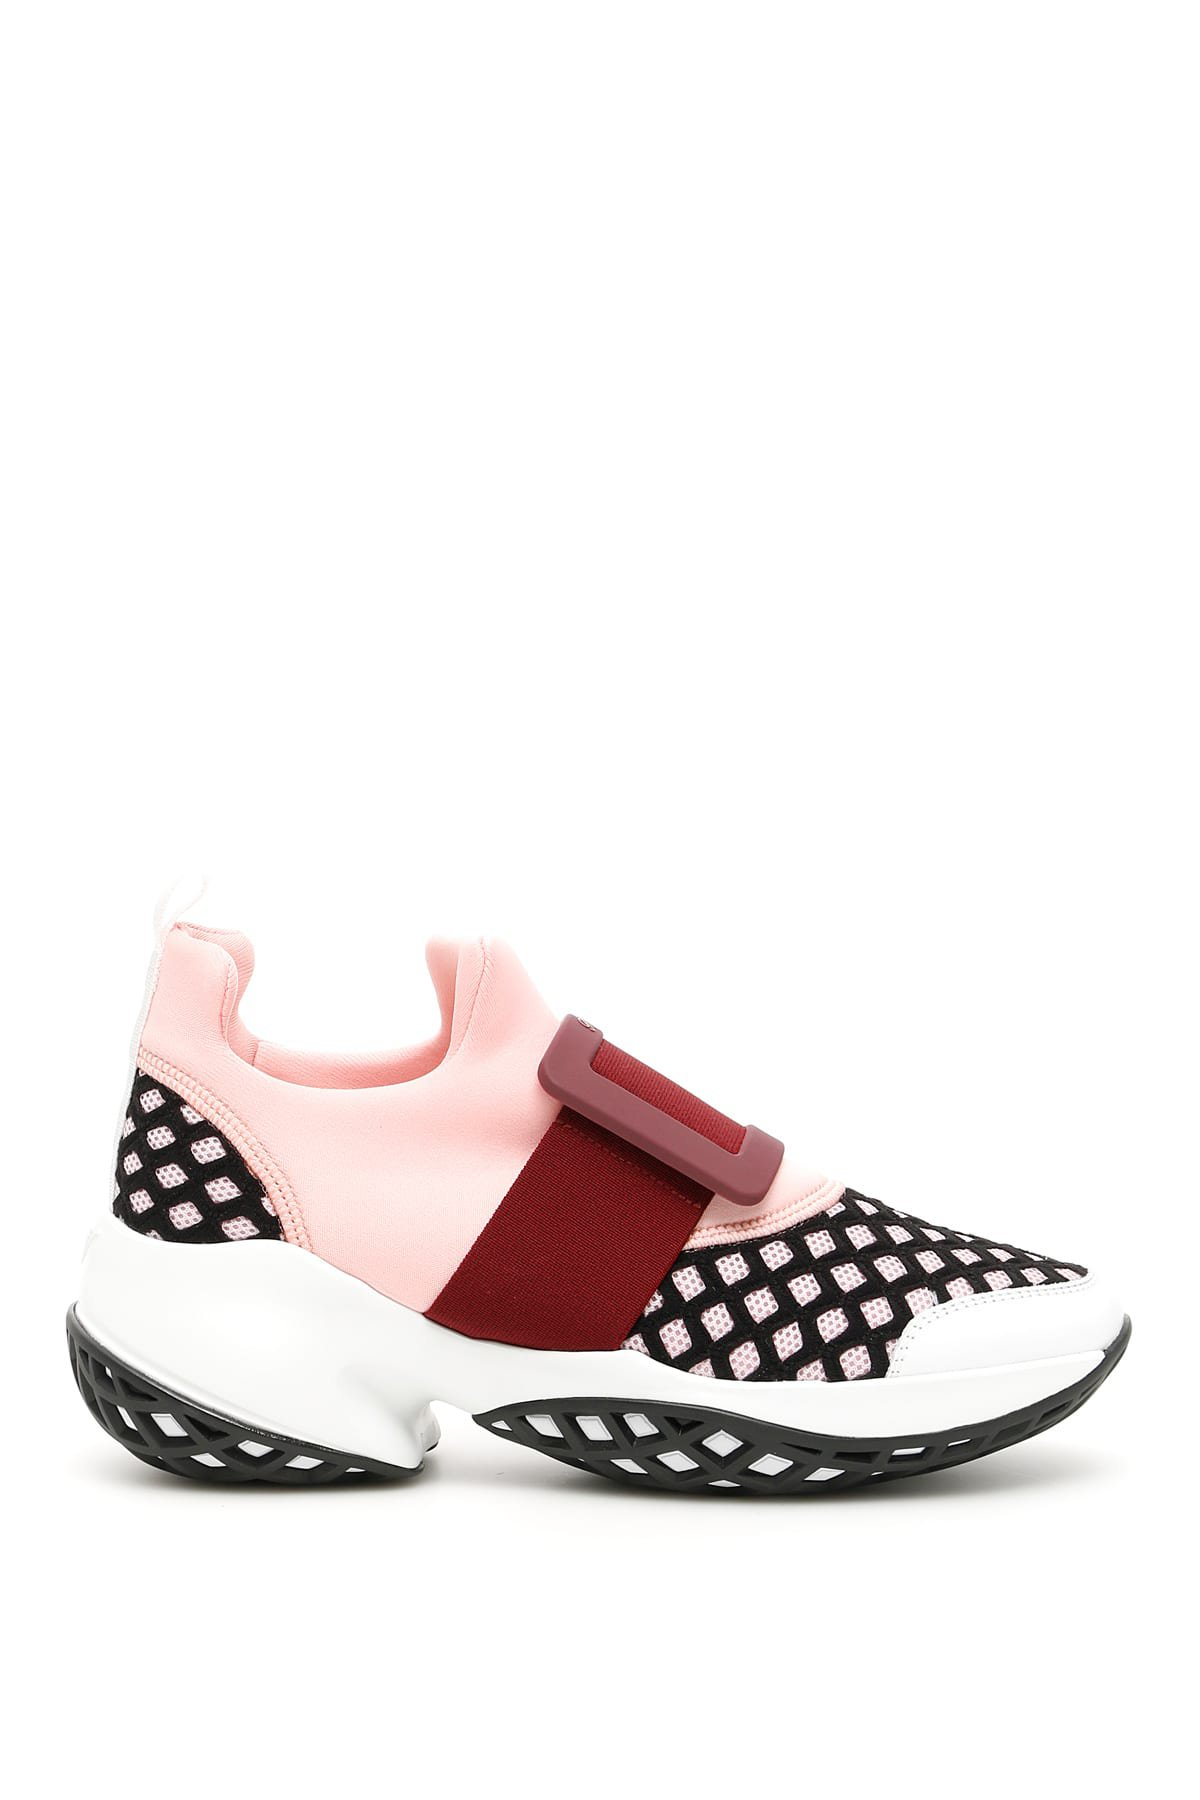 Roger Vivier Viv Run Multicolor Sneakers